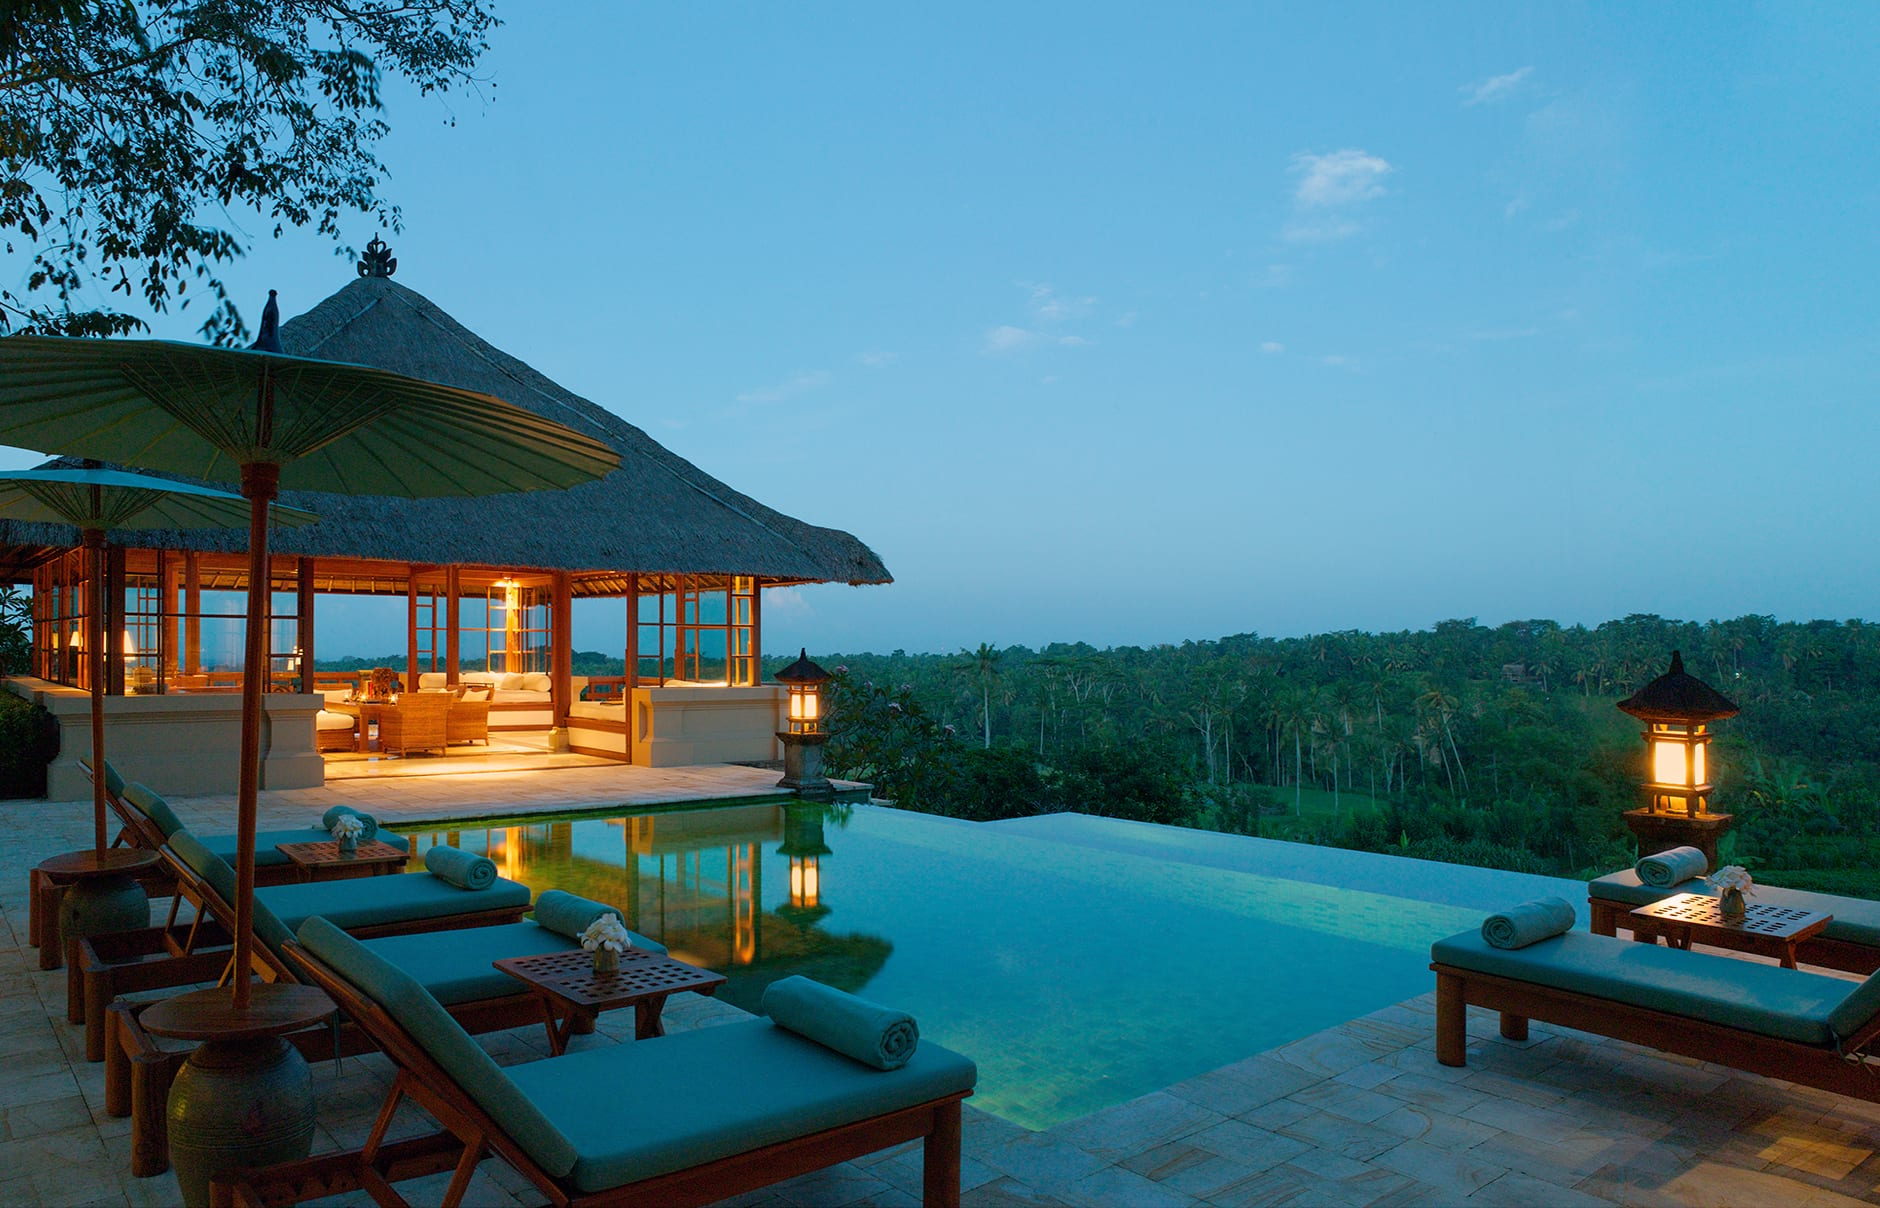 Villa. Amandari, Bali, Indonesia. © Amanresorts